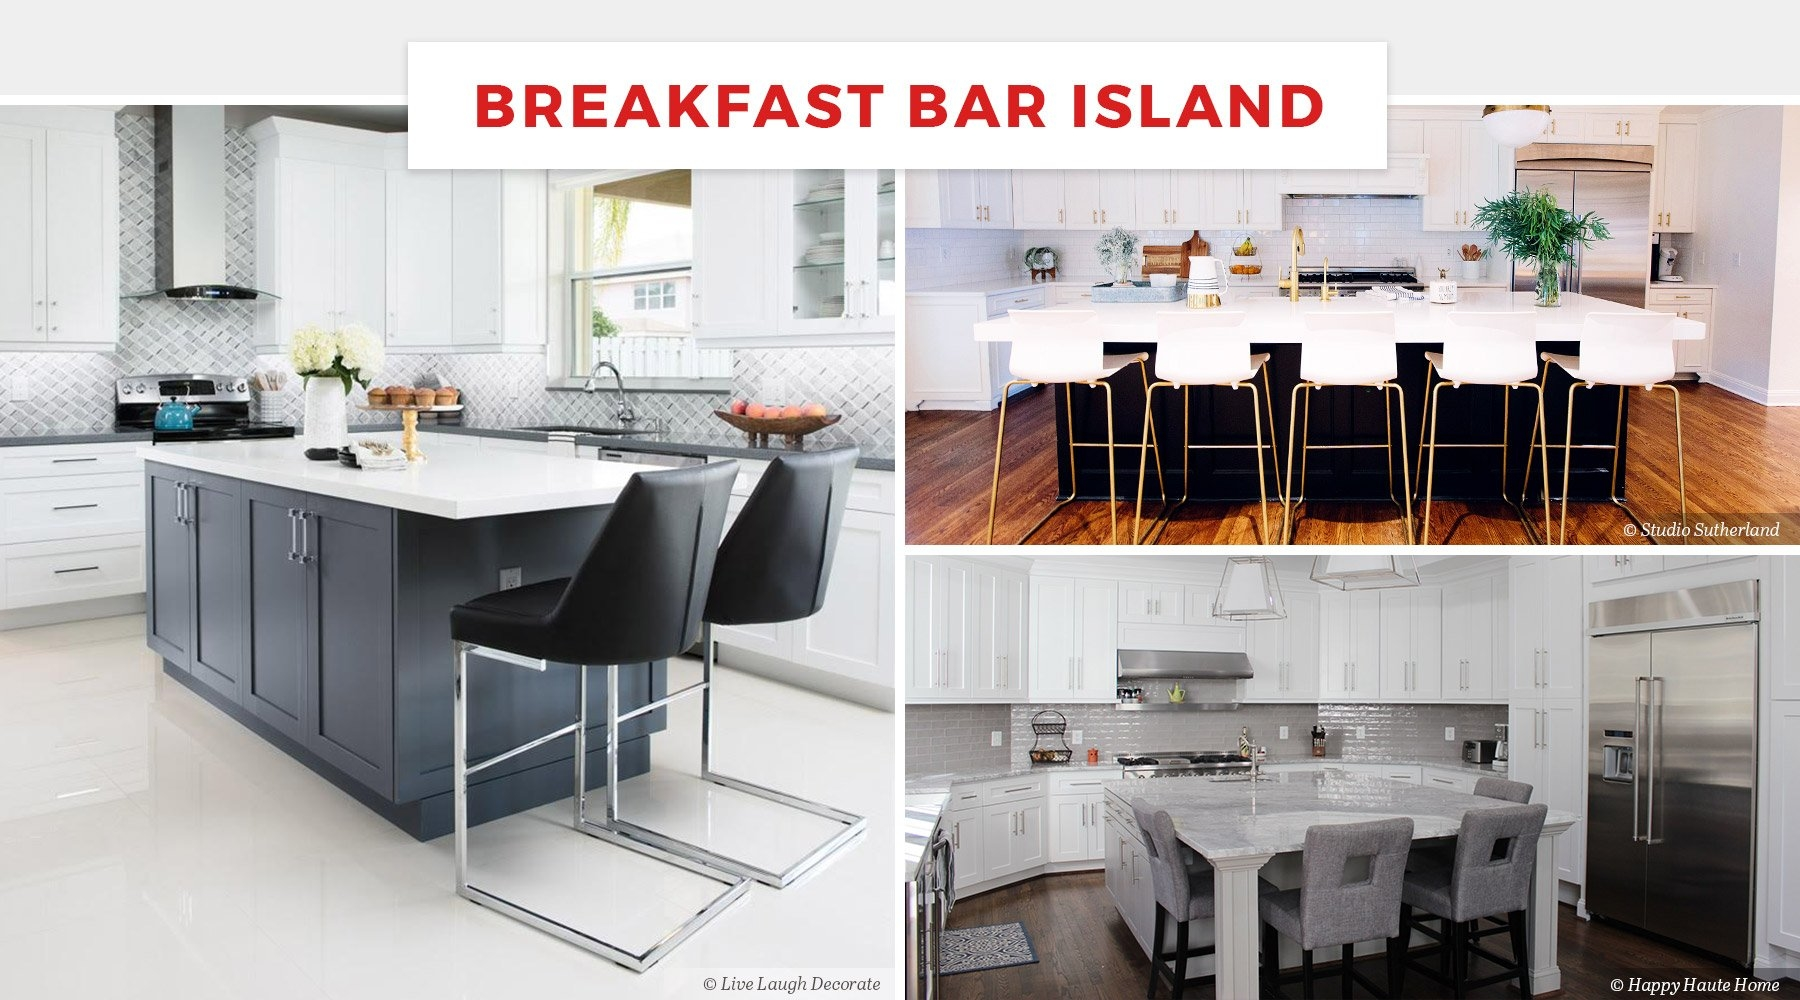 modern kitchen bar ideas kitchen bar islands bar stools with storage kitchen island with stools and